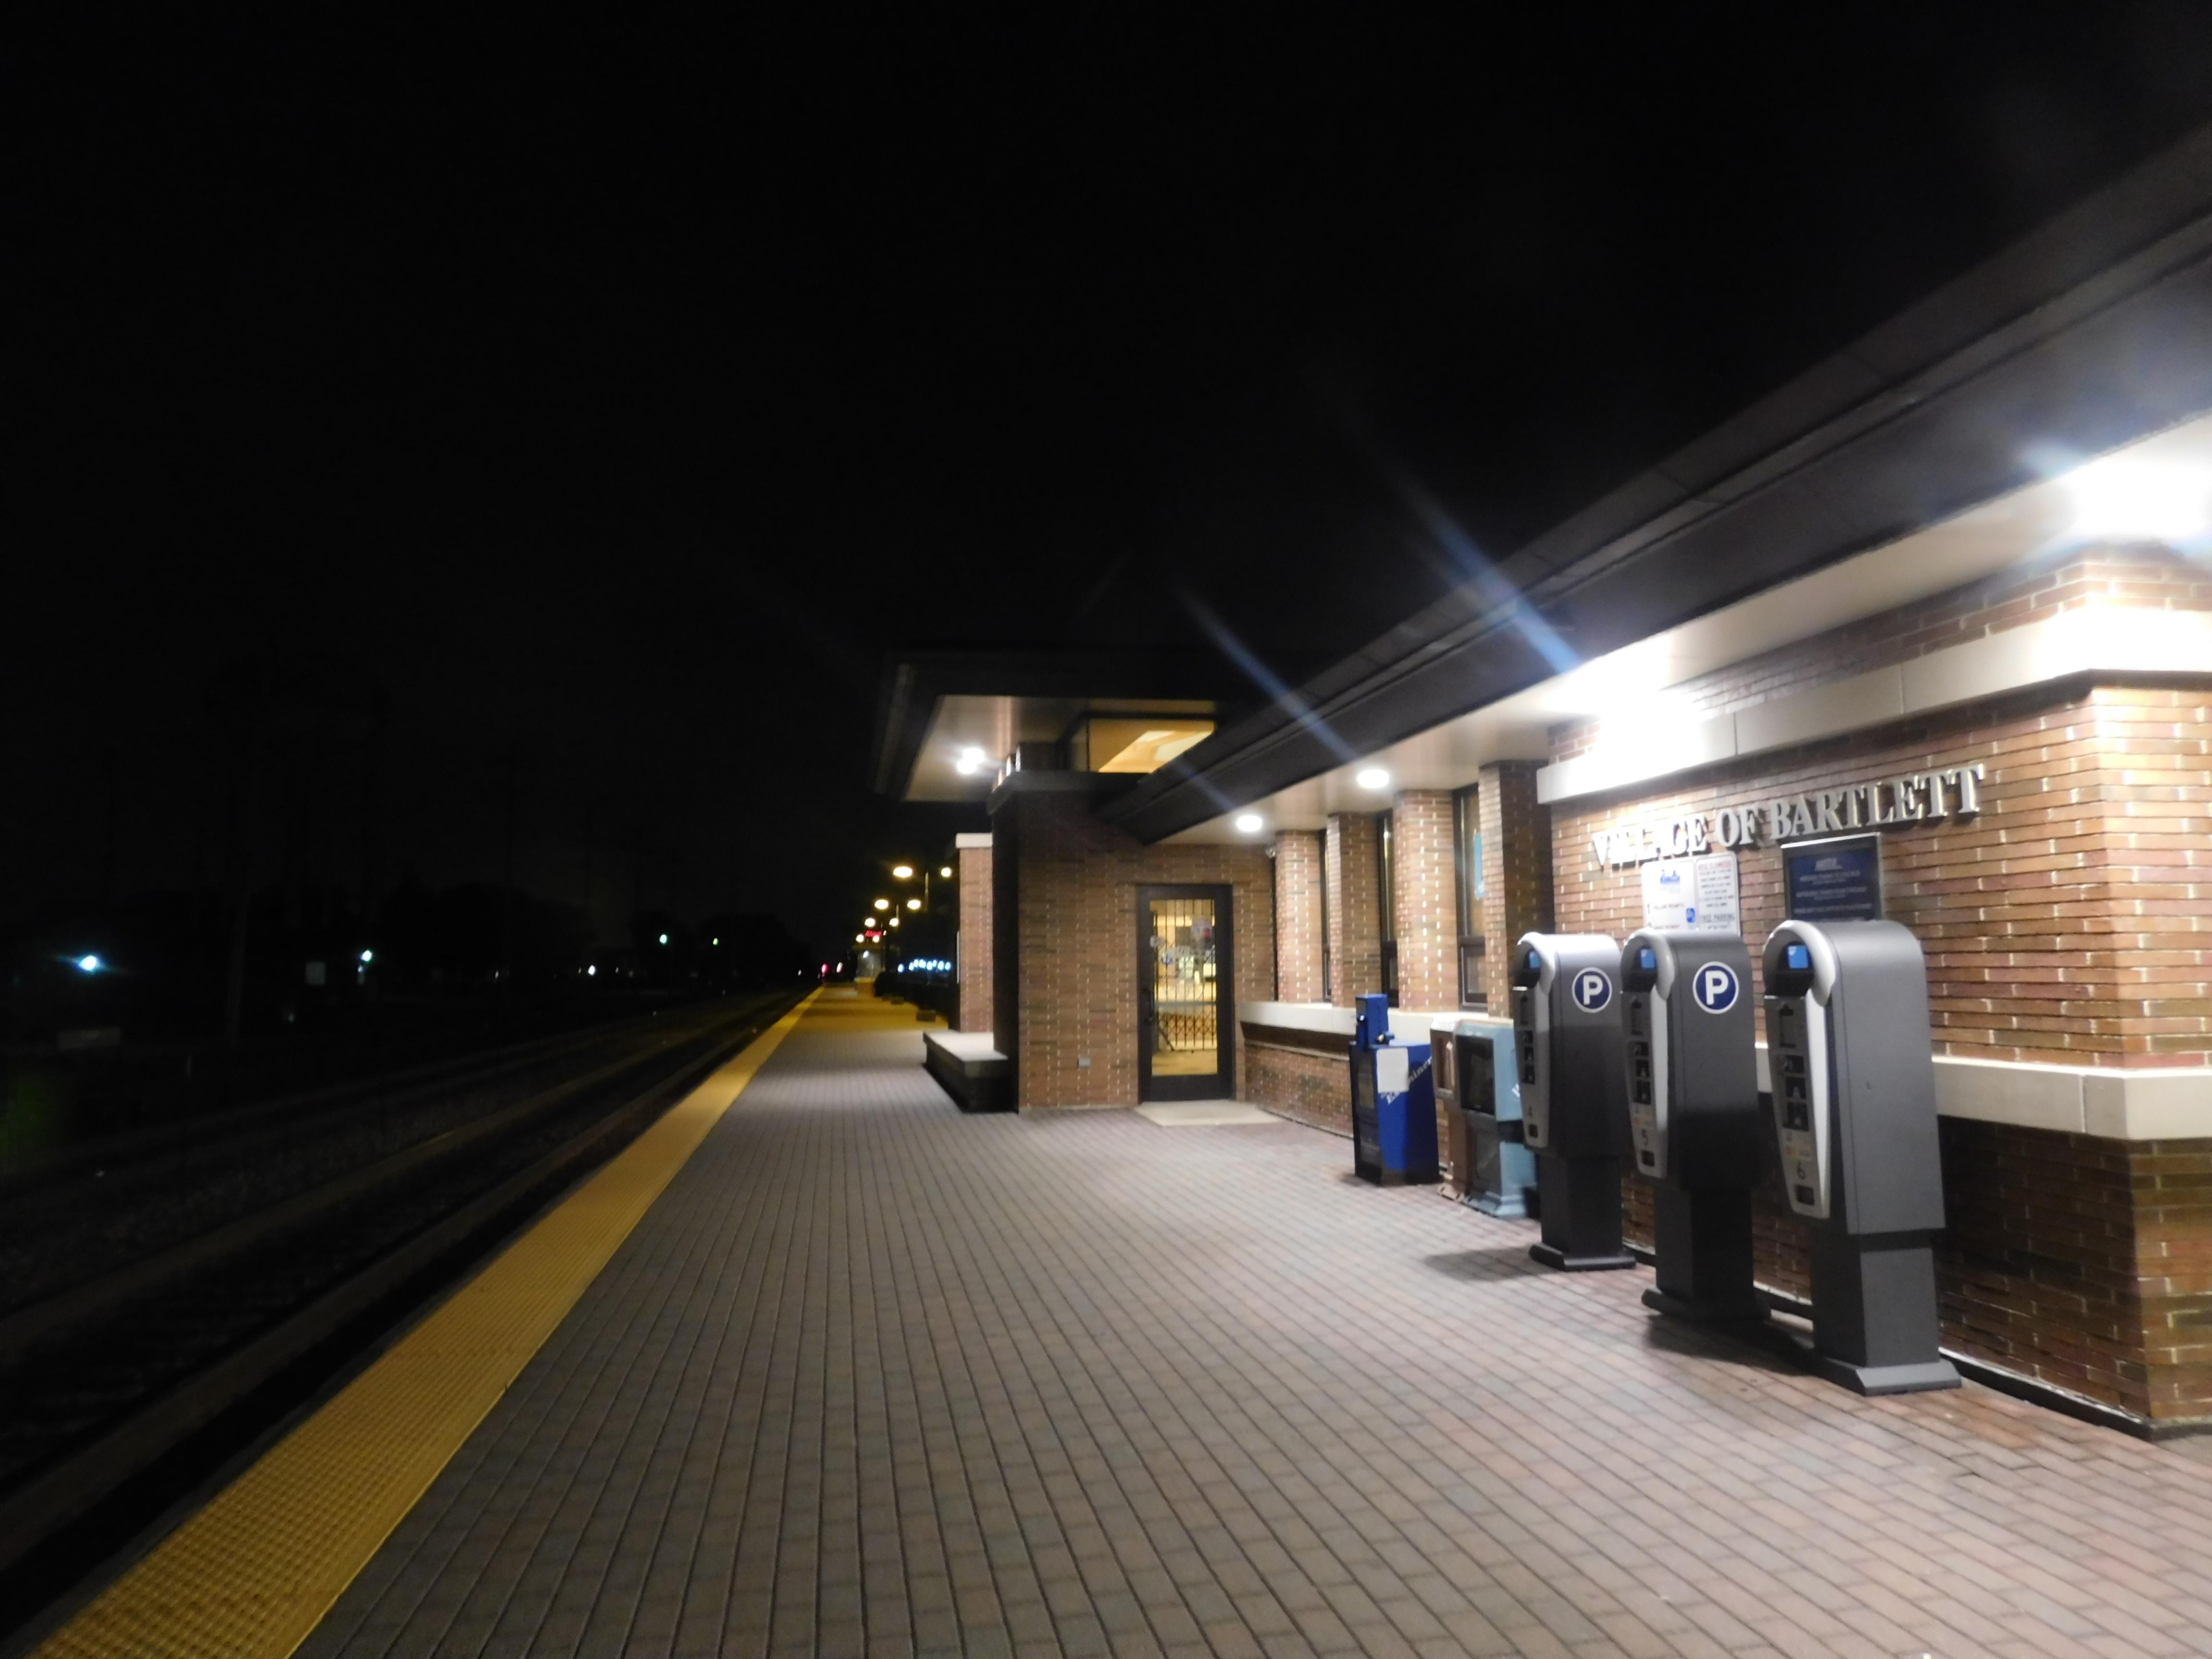 Bartlett station - Wikipedia